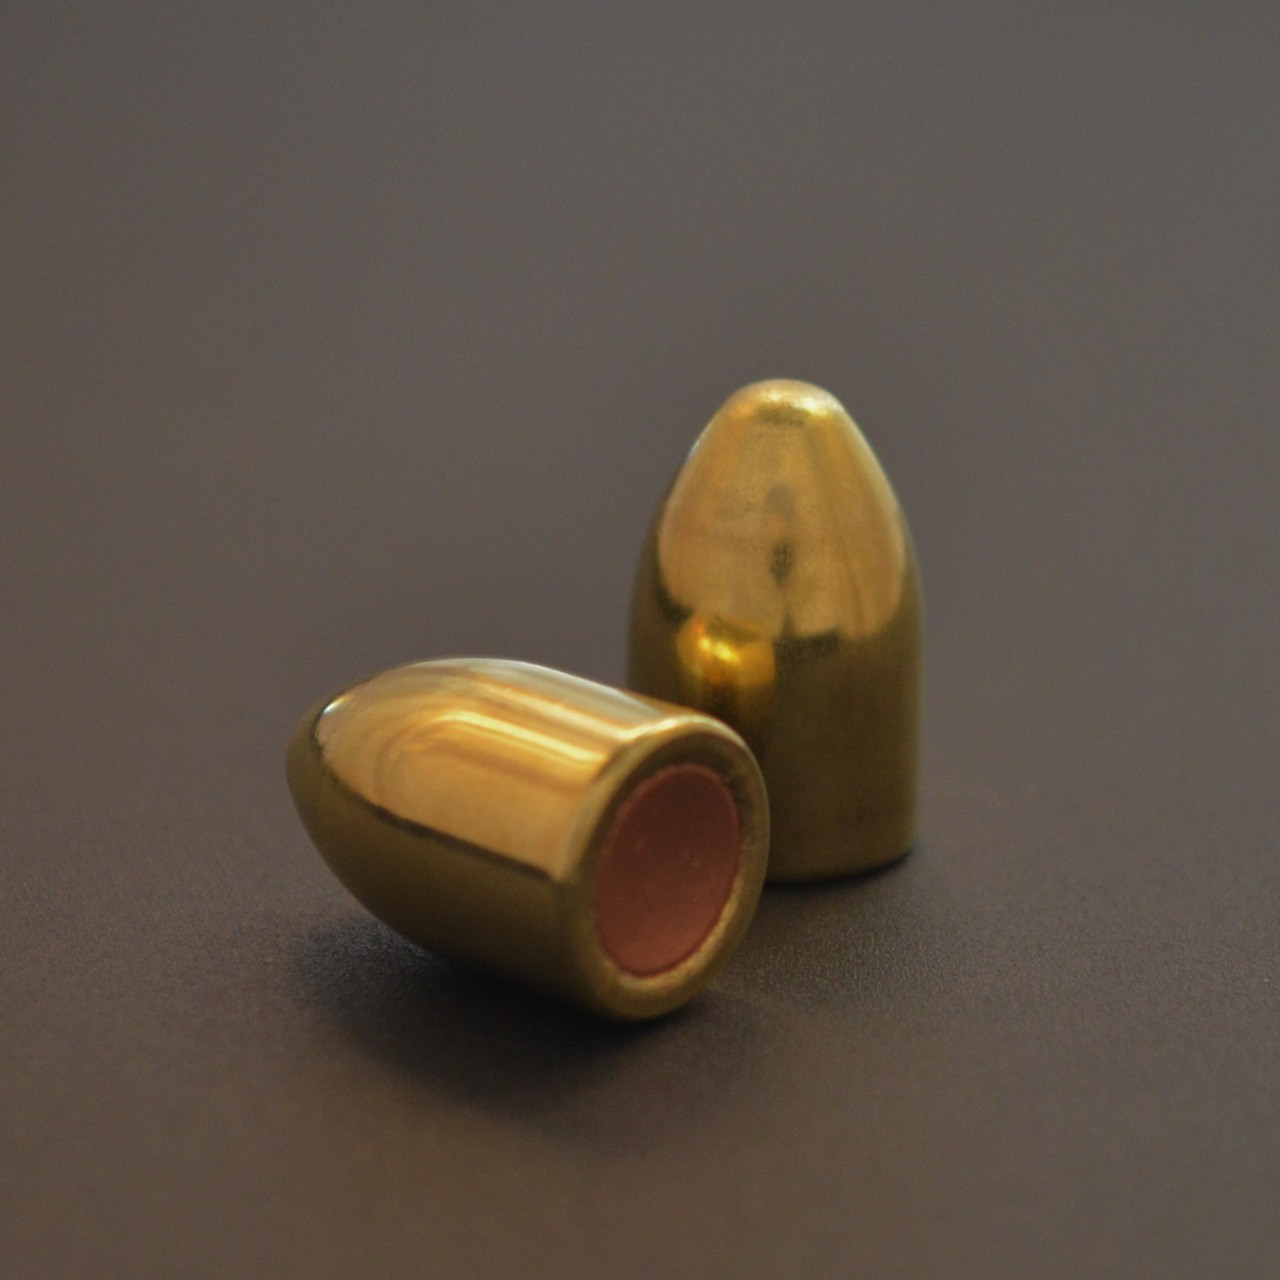 9mm/115gr CMJ - 1,000ct